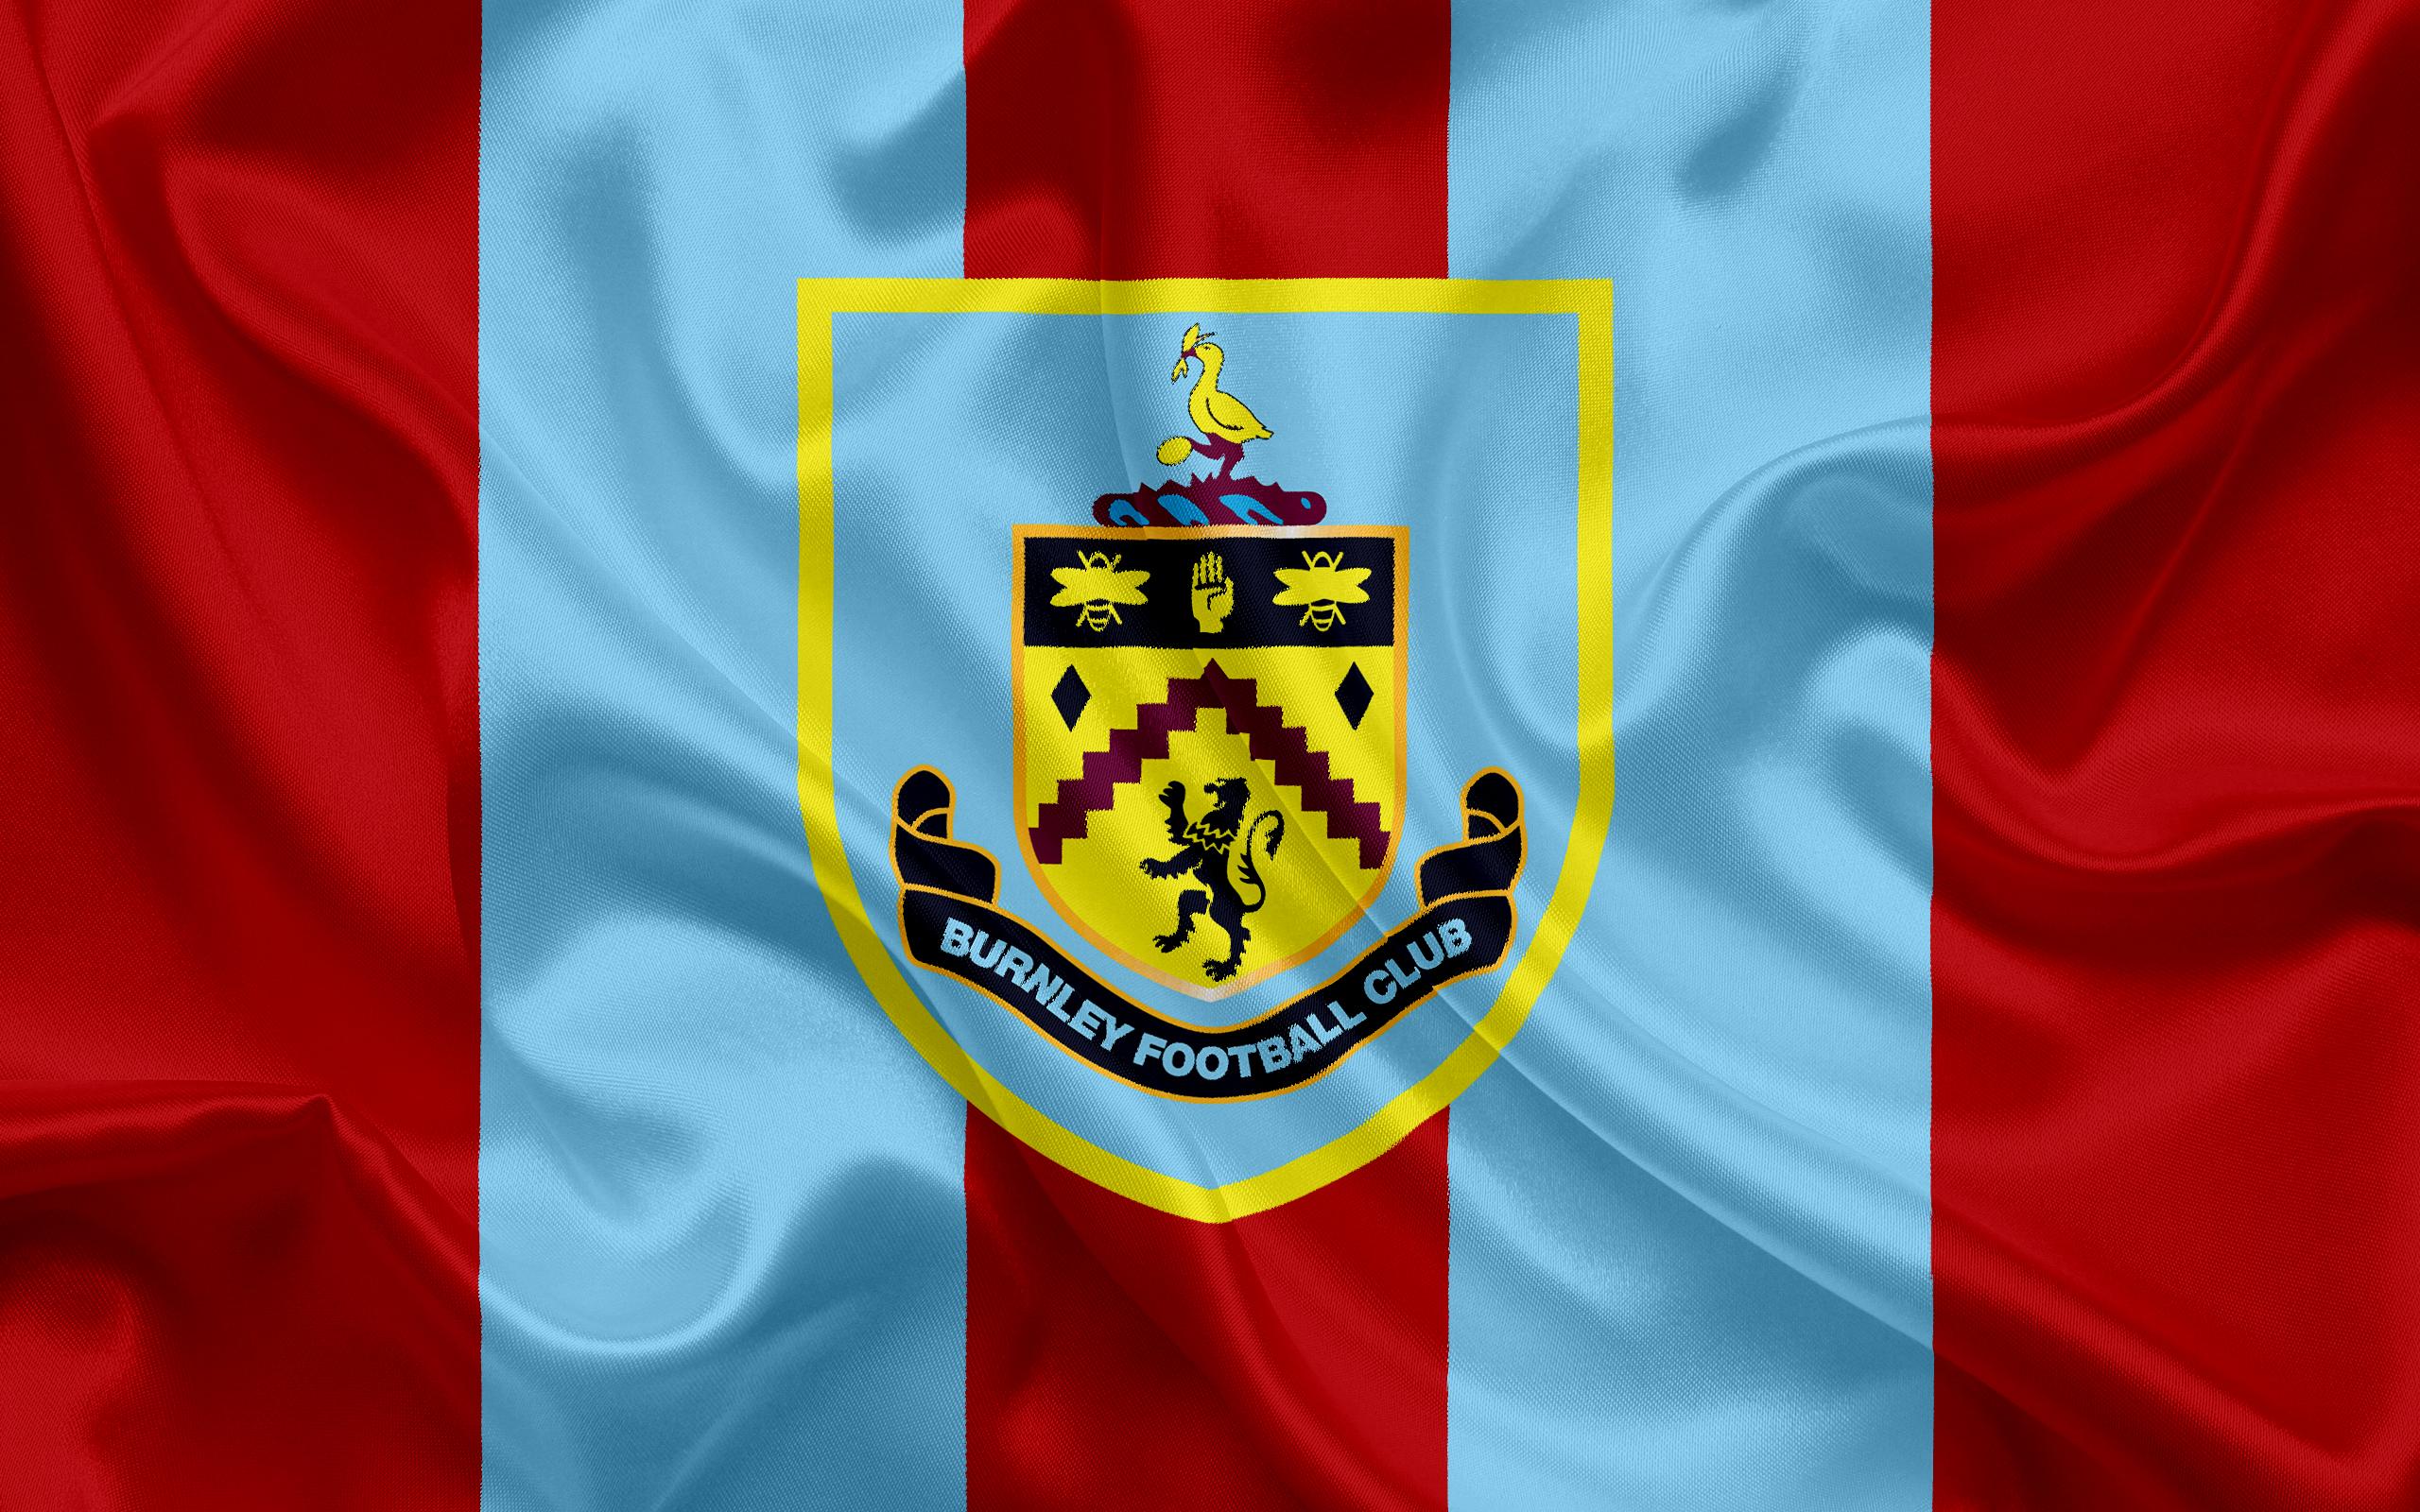 Download wallpapers Burnley Football Club Premier League 2560x1600